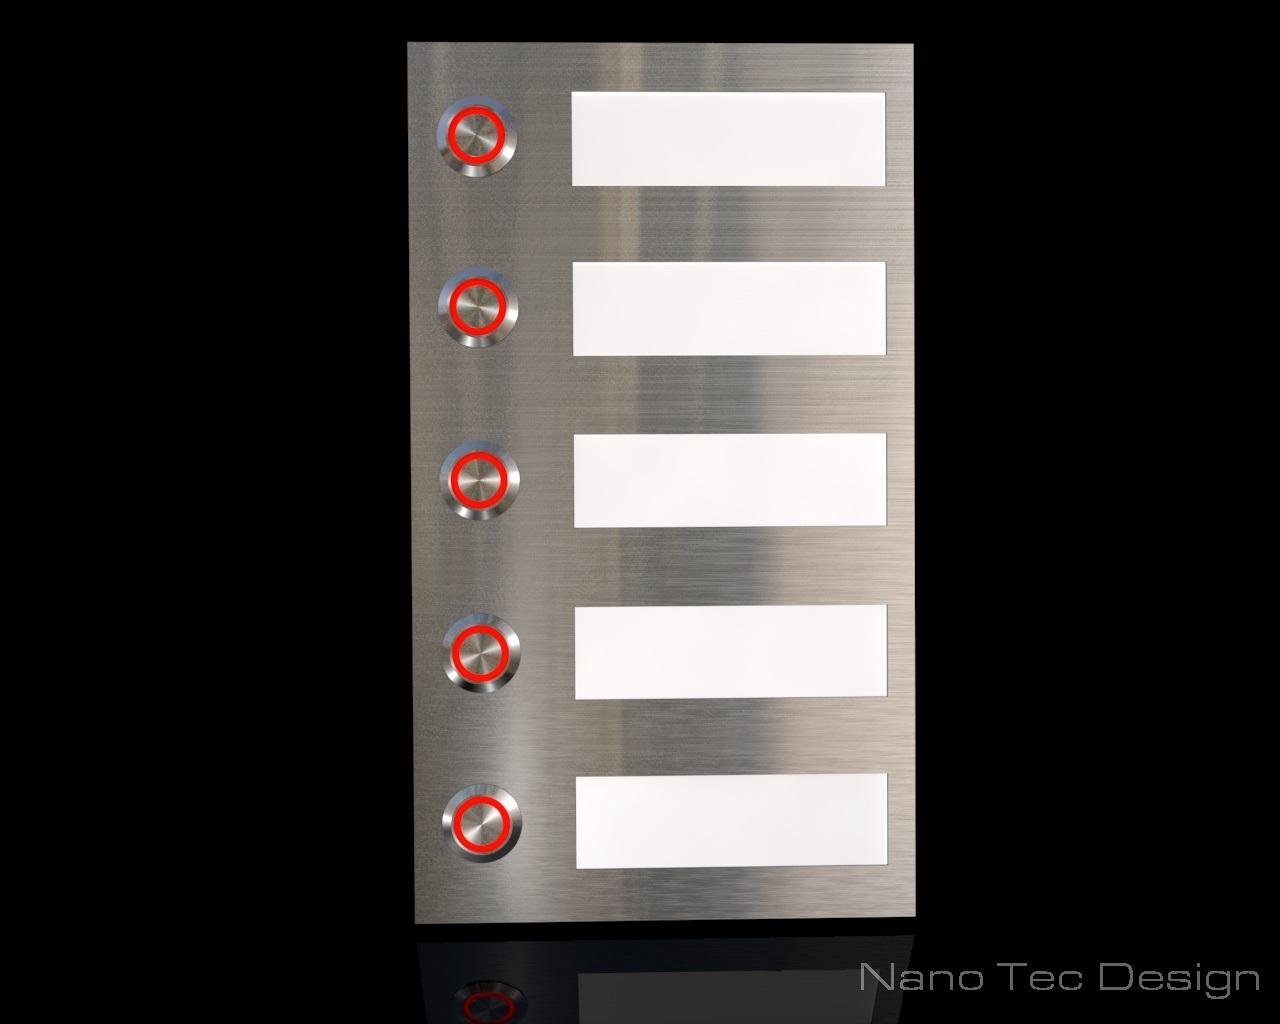 5 Familien Edelstahlklingel mit Led- Beleuchtung